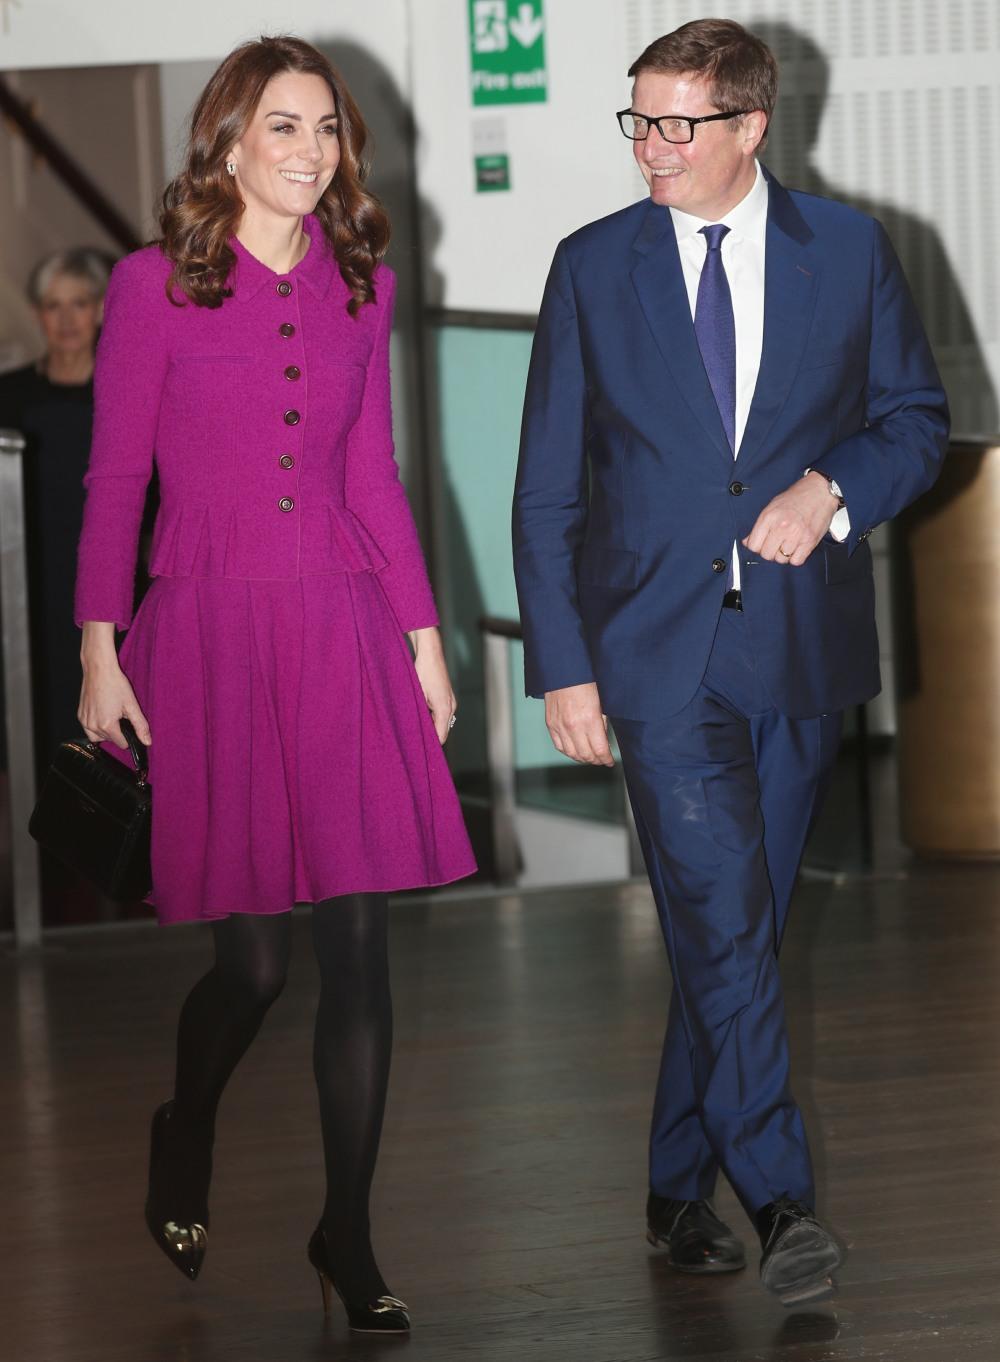 Duchess Kate repeats an Oscar de la Renta suit at the Royal Opera House